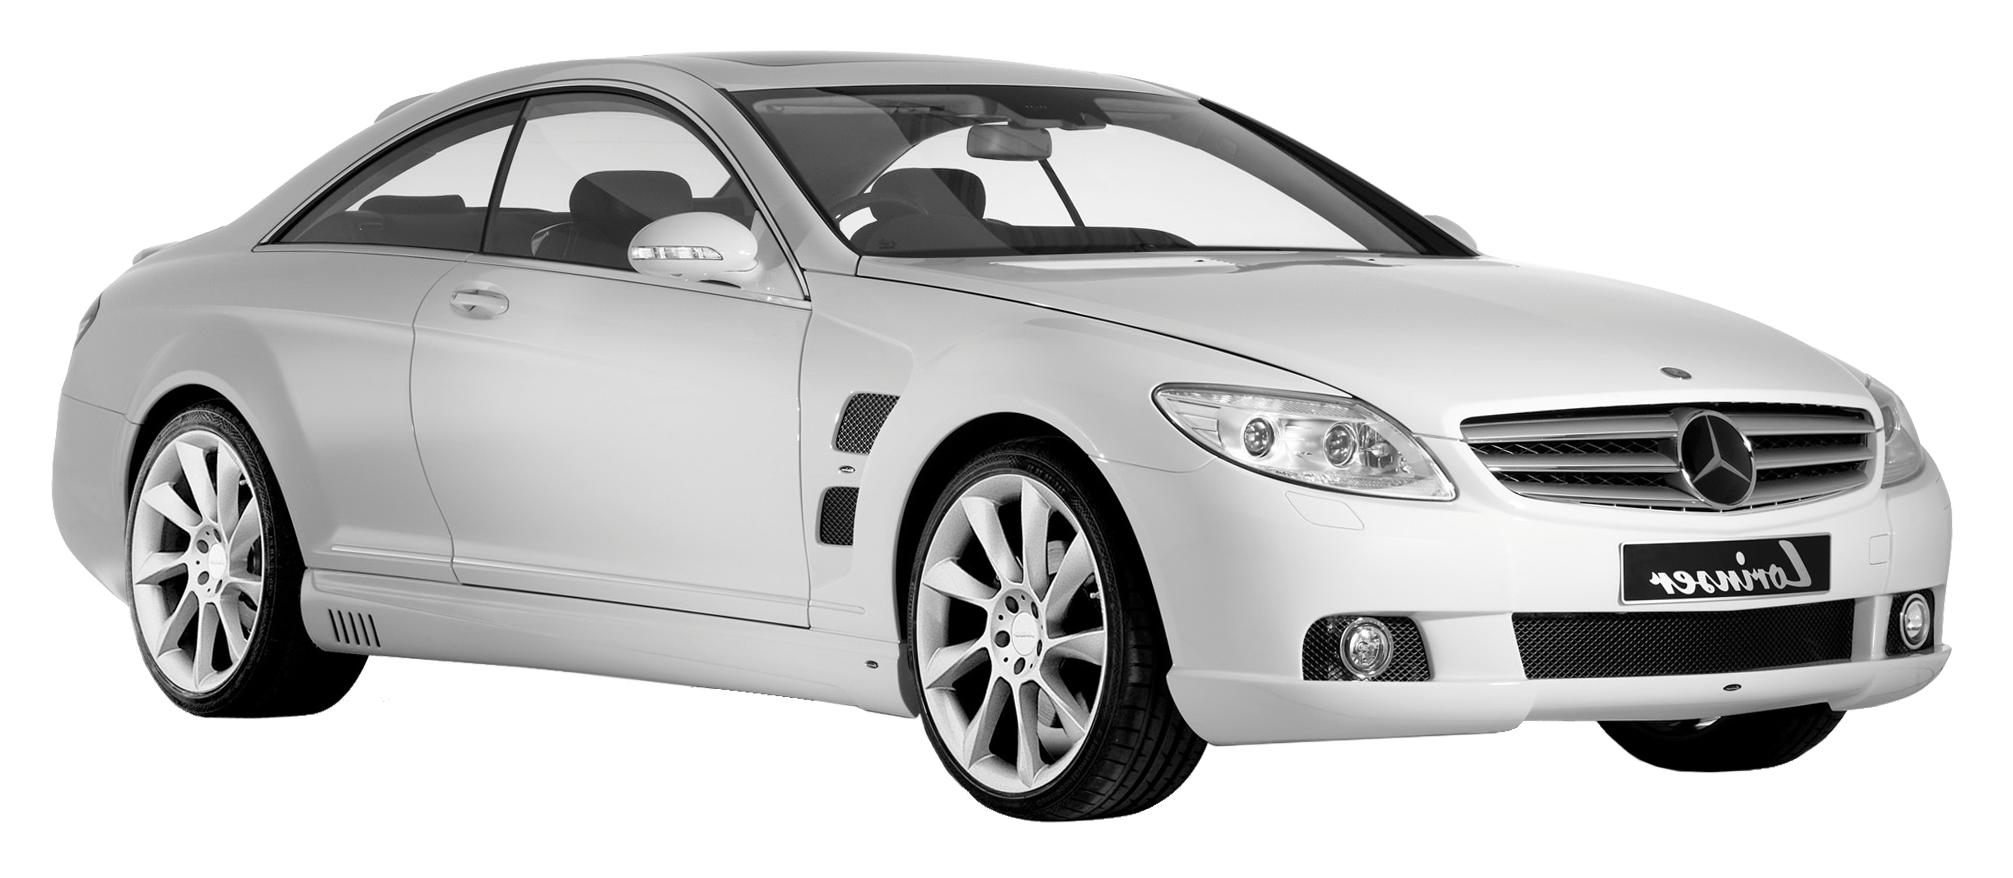 Clipart cars suv. Car png transparent images